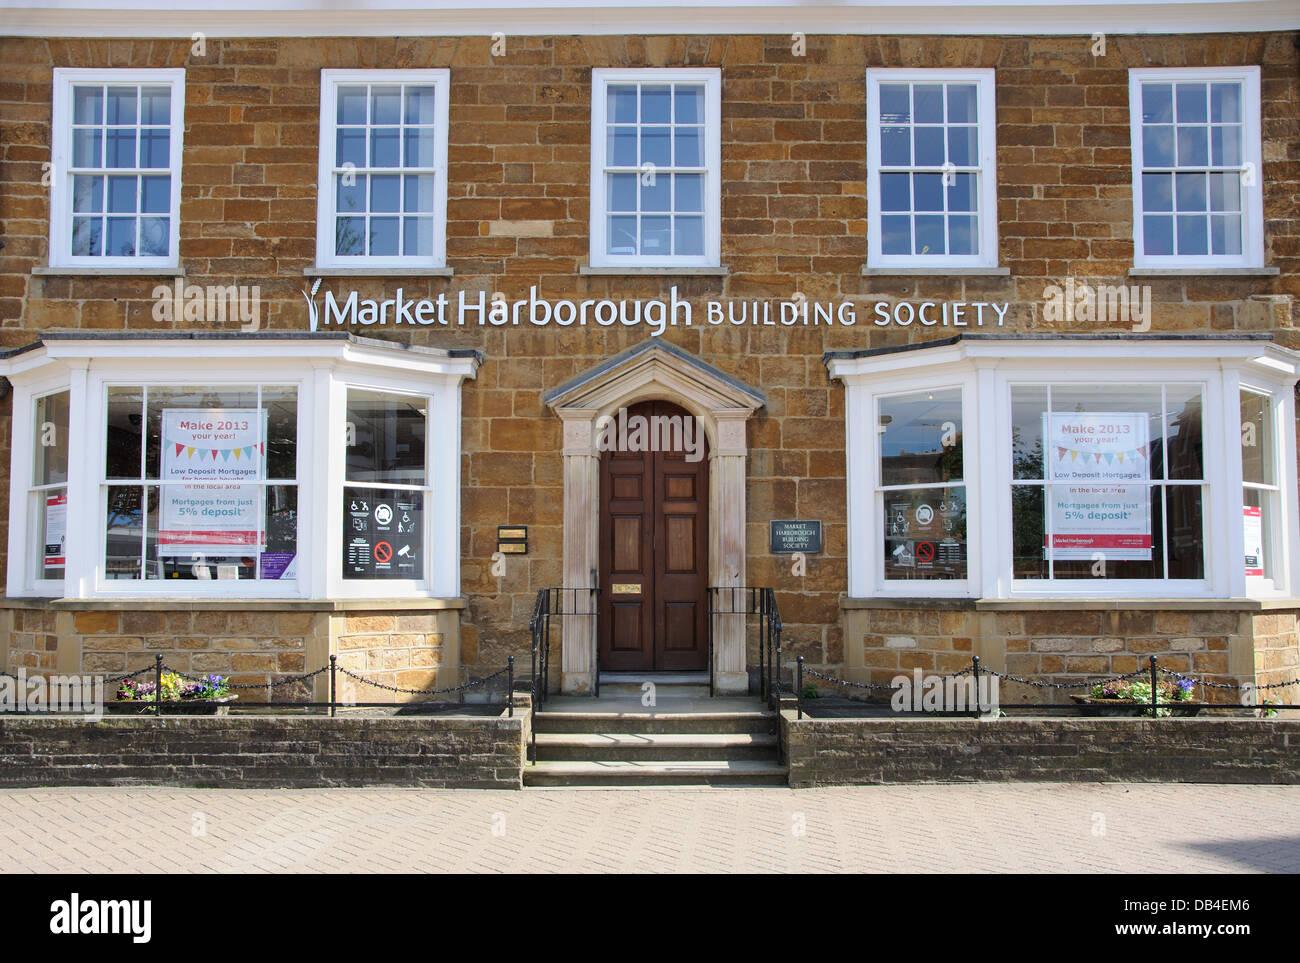 Market Harborough Building Society Head Office